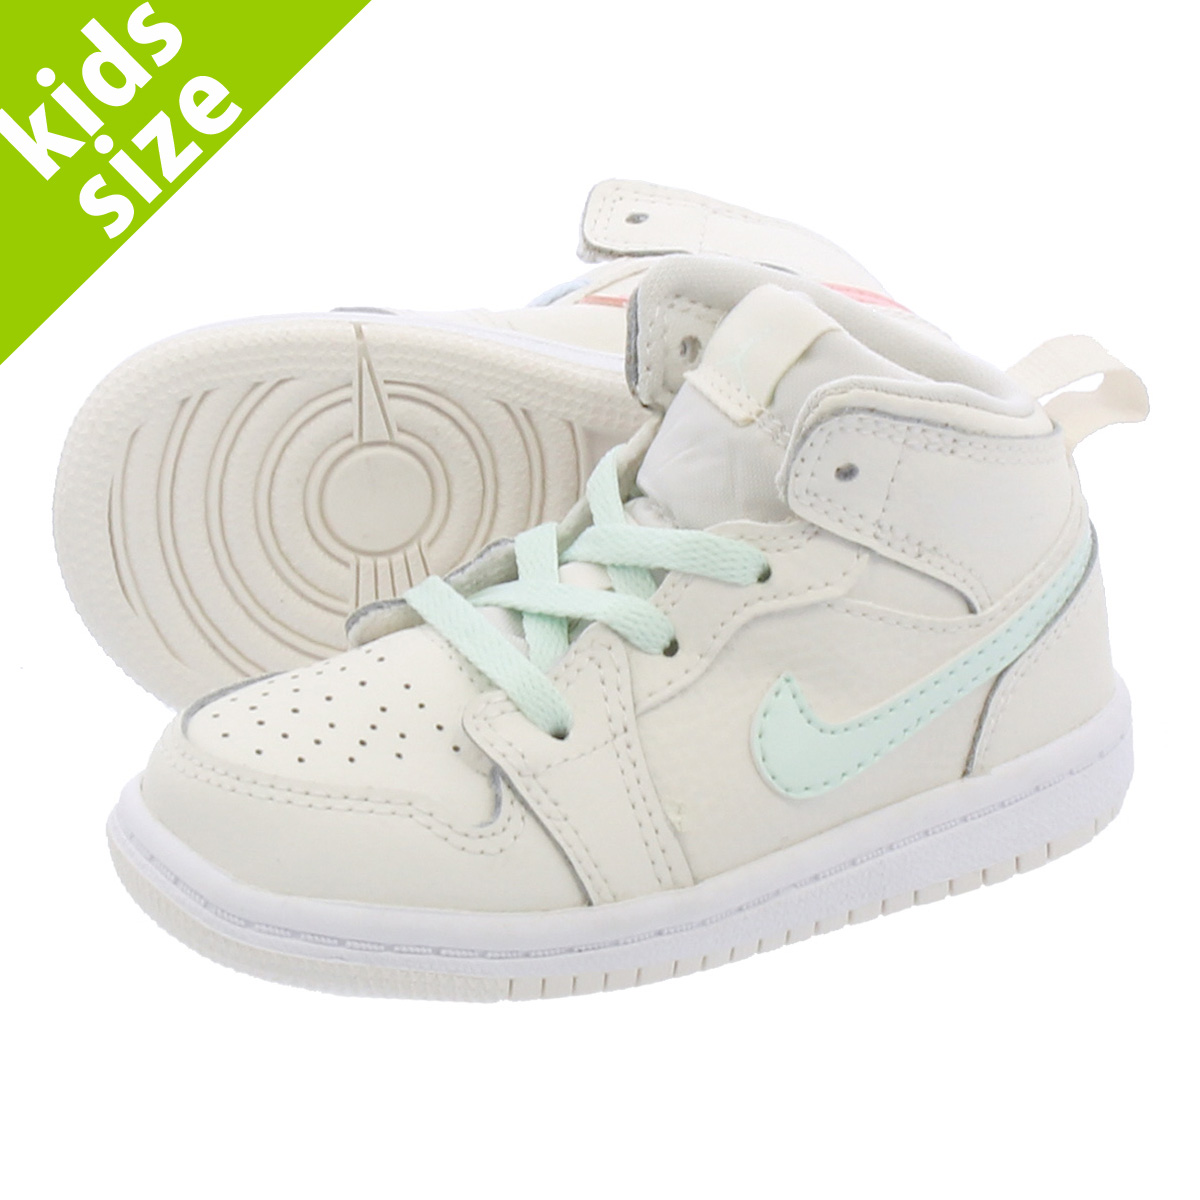 new arrival a8f0c 66472 NIKE AIR JORDAN 1 MID GT Nike Air Jordan 1 mid GT PHANTOM IGLOO PURPLE  RISE BLUE TINT 644,507-035